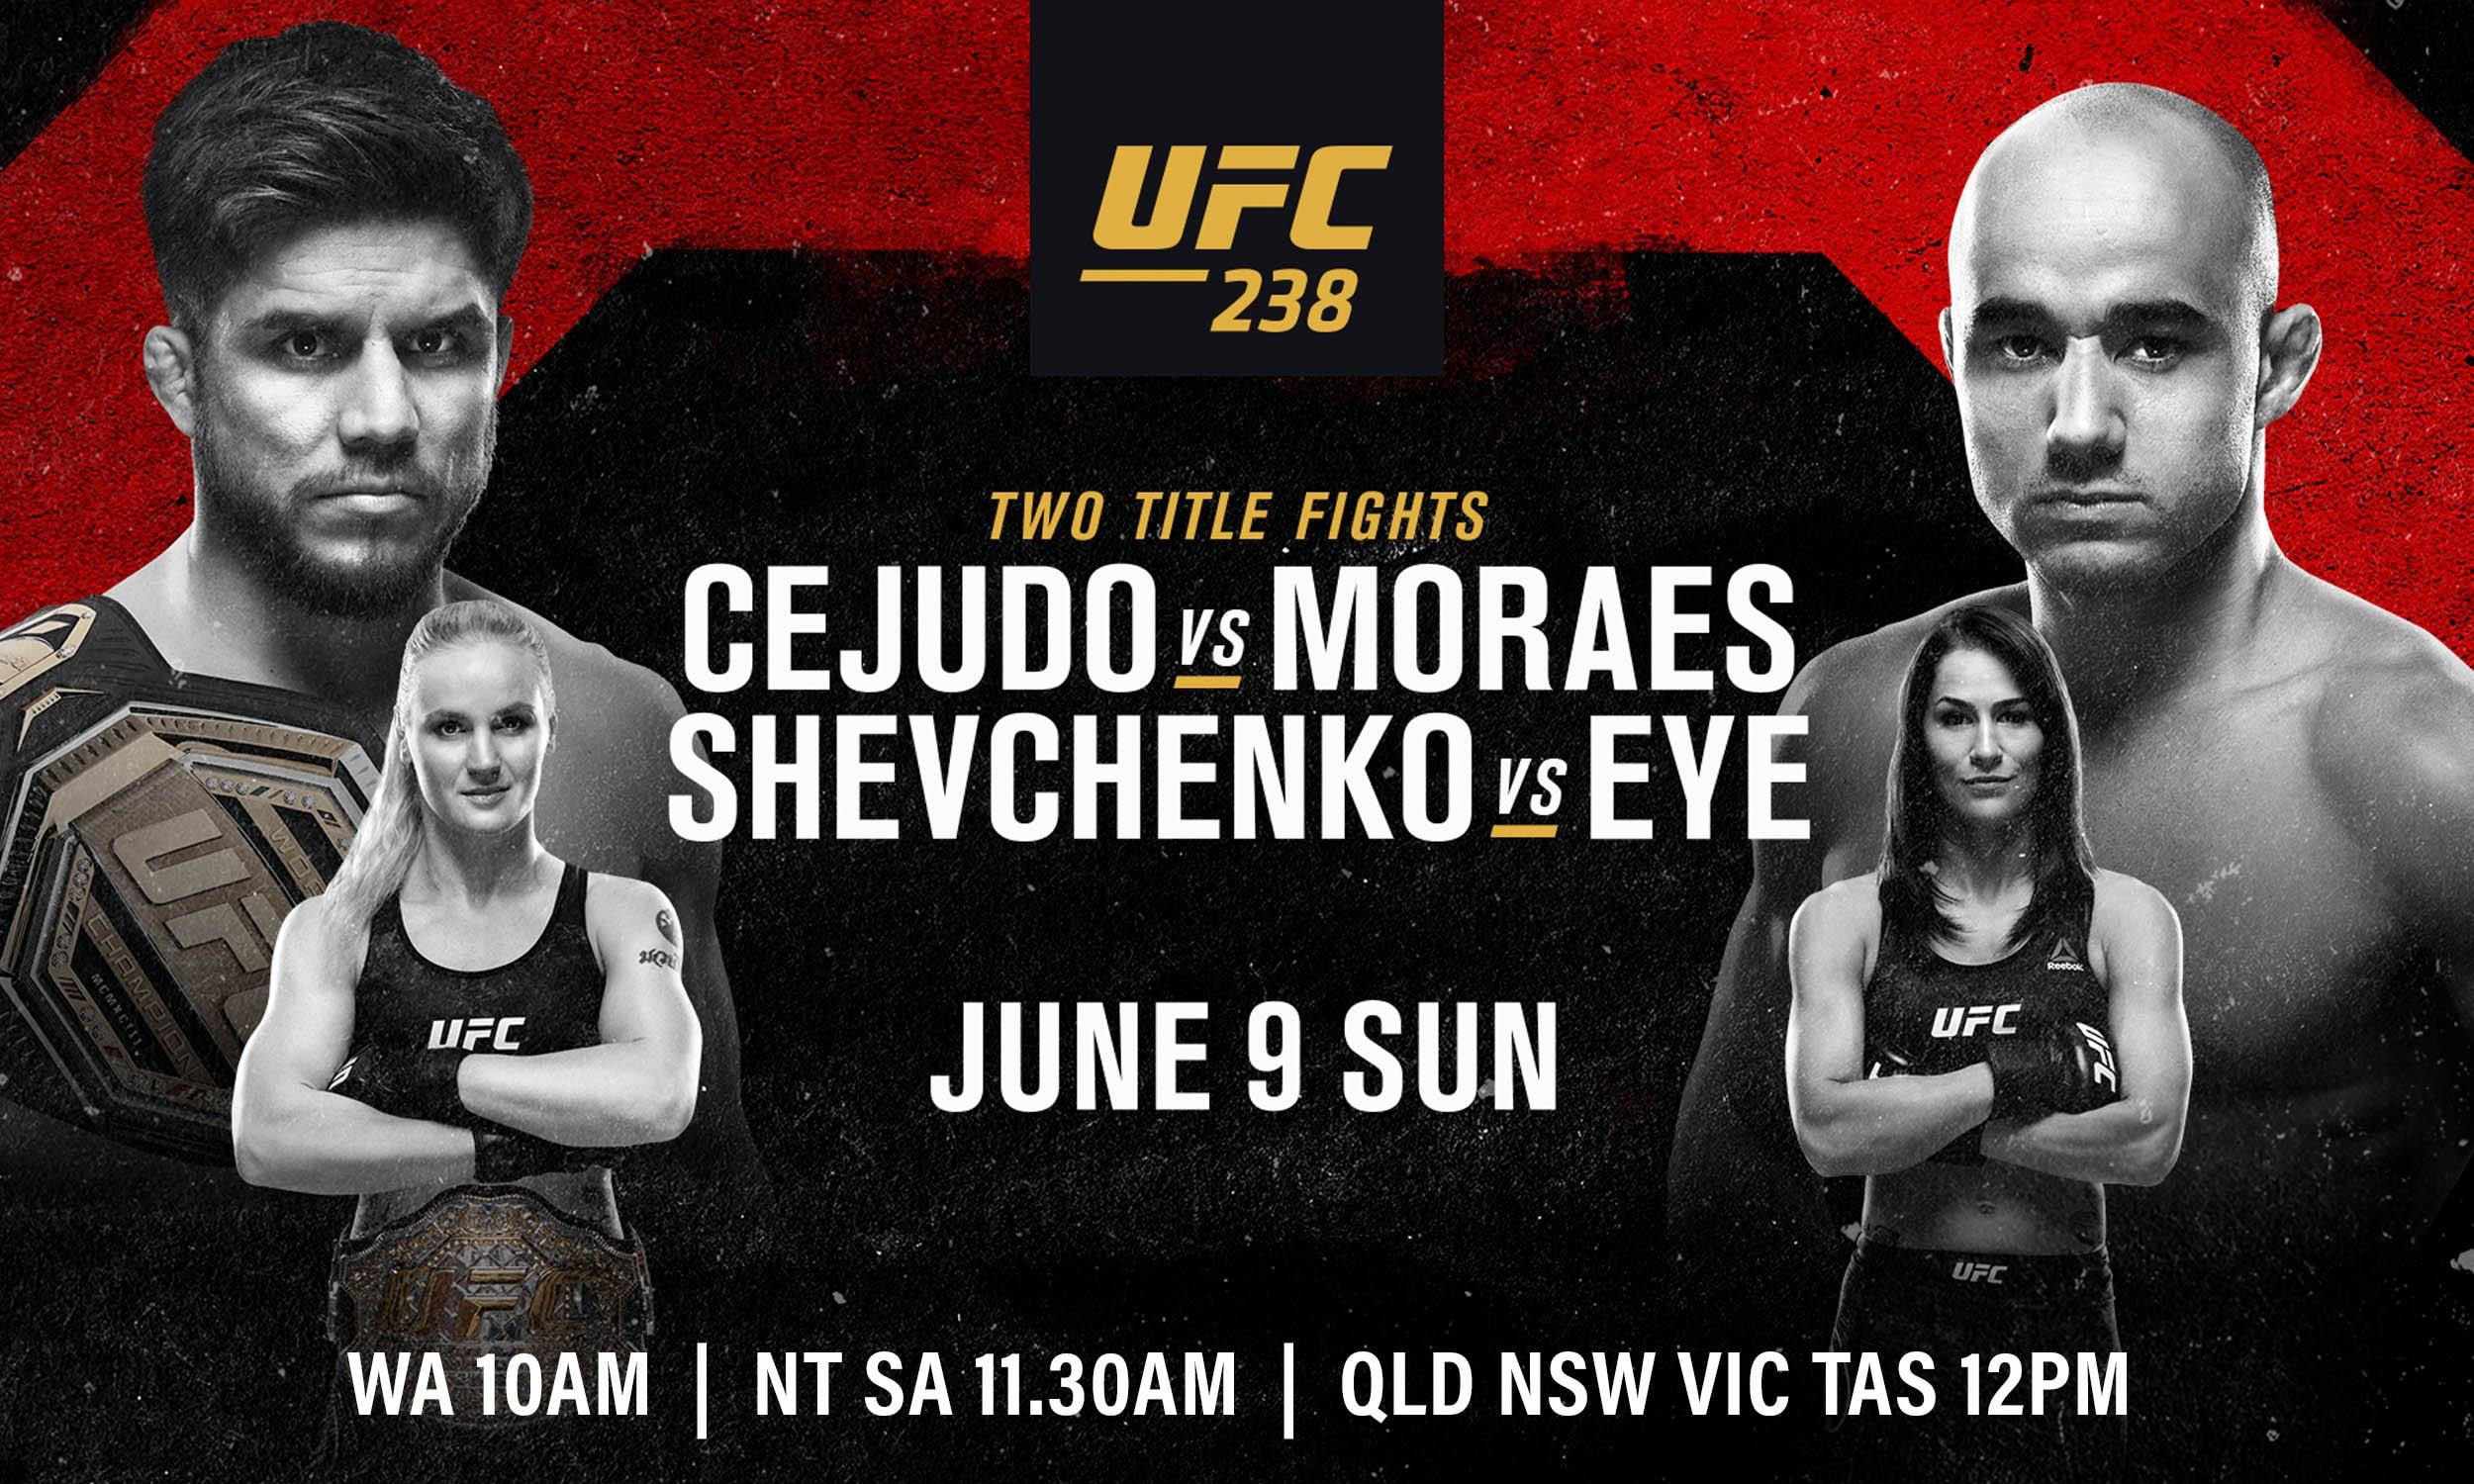 UFC 238_Banner Image_1500x2500-min (1).jpg